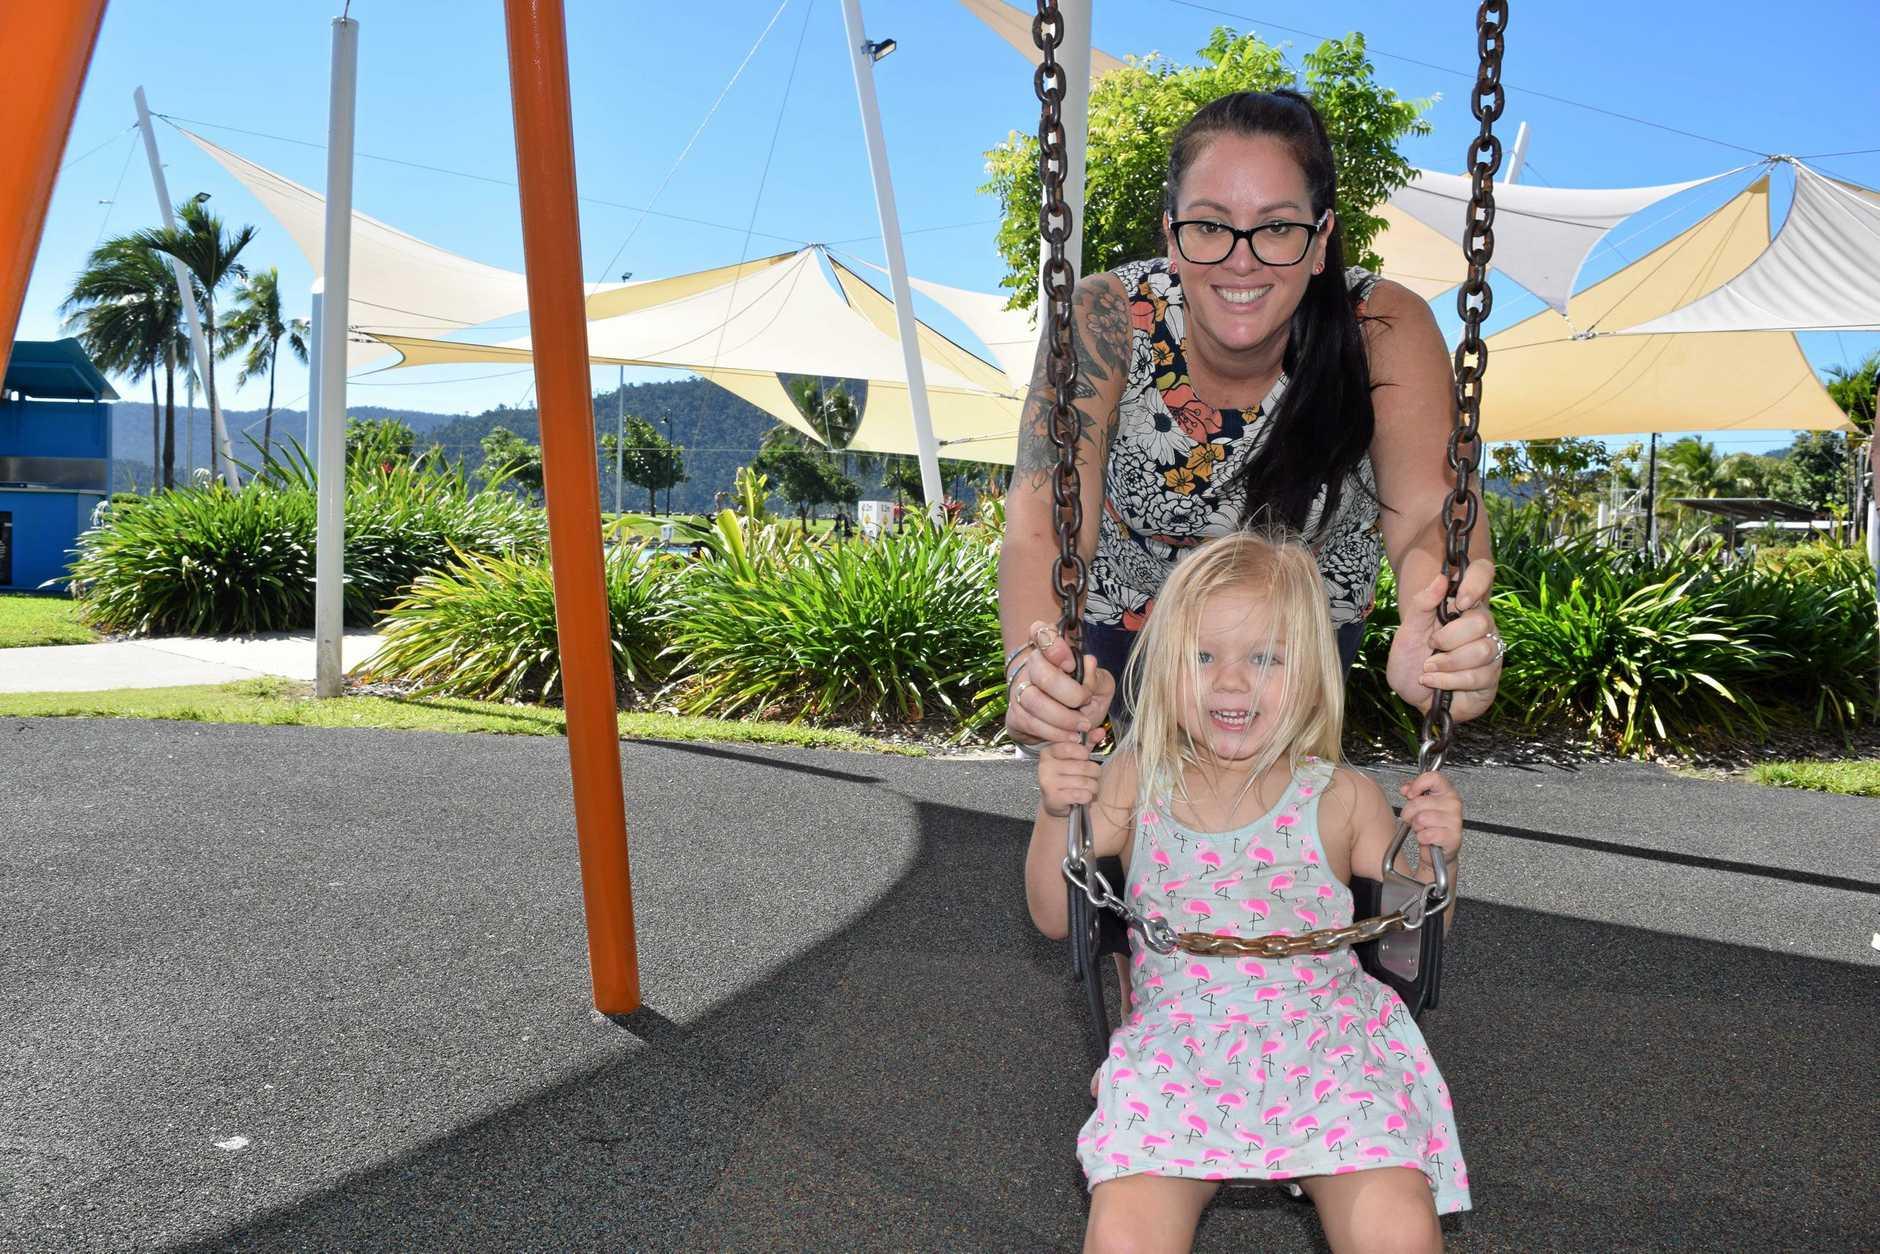 Cannonvale's Mez Bowen with daughter Piper Bowen, 3.